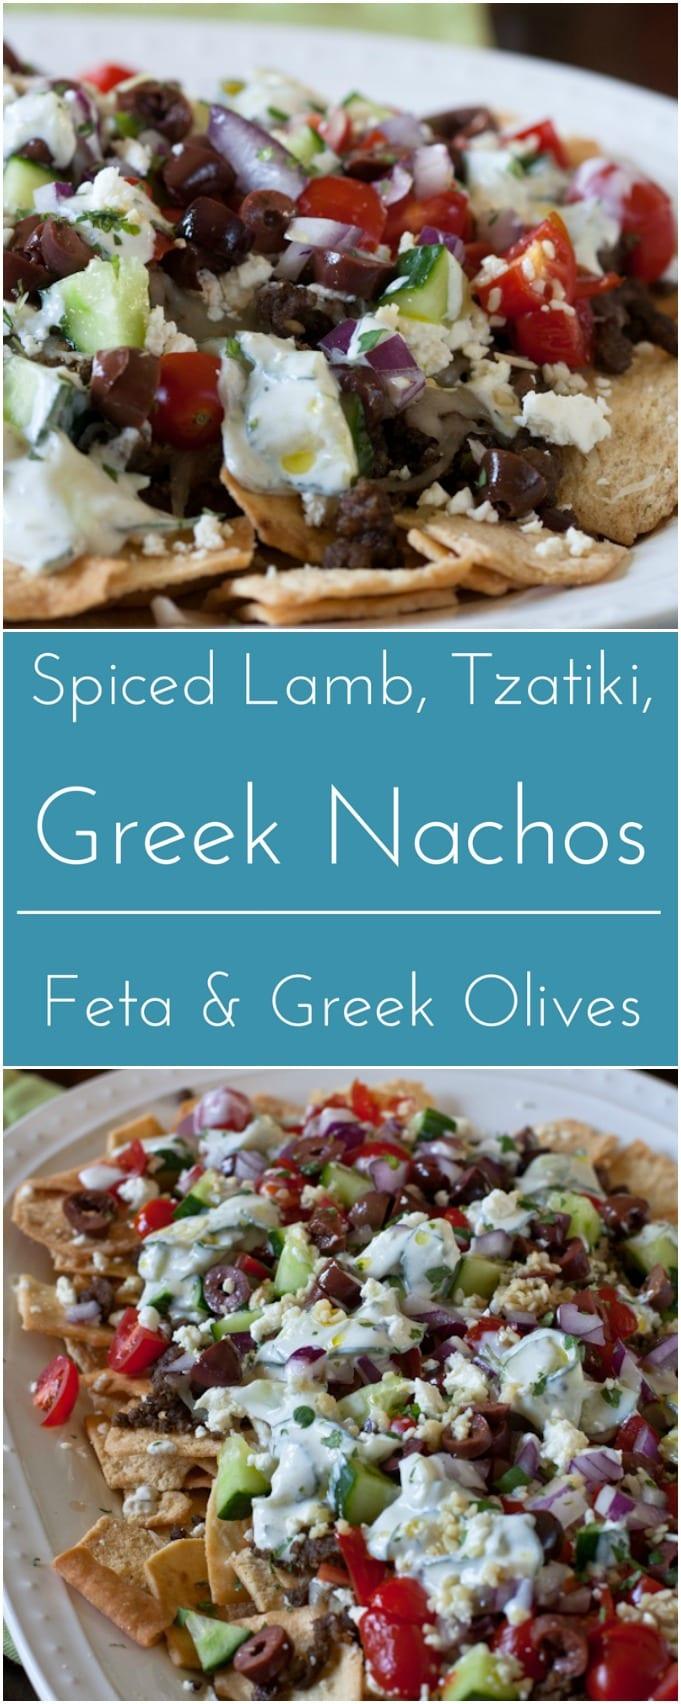 Loaded Greek nachos with Spiced Lamb, tzatziki, feta and Greek olives.